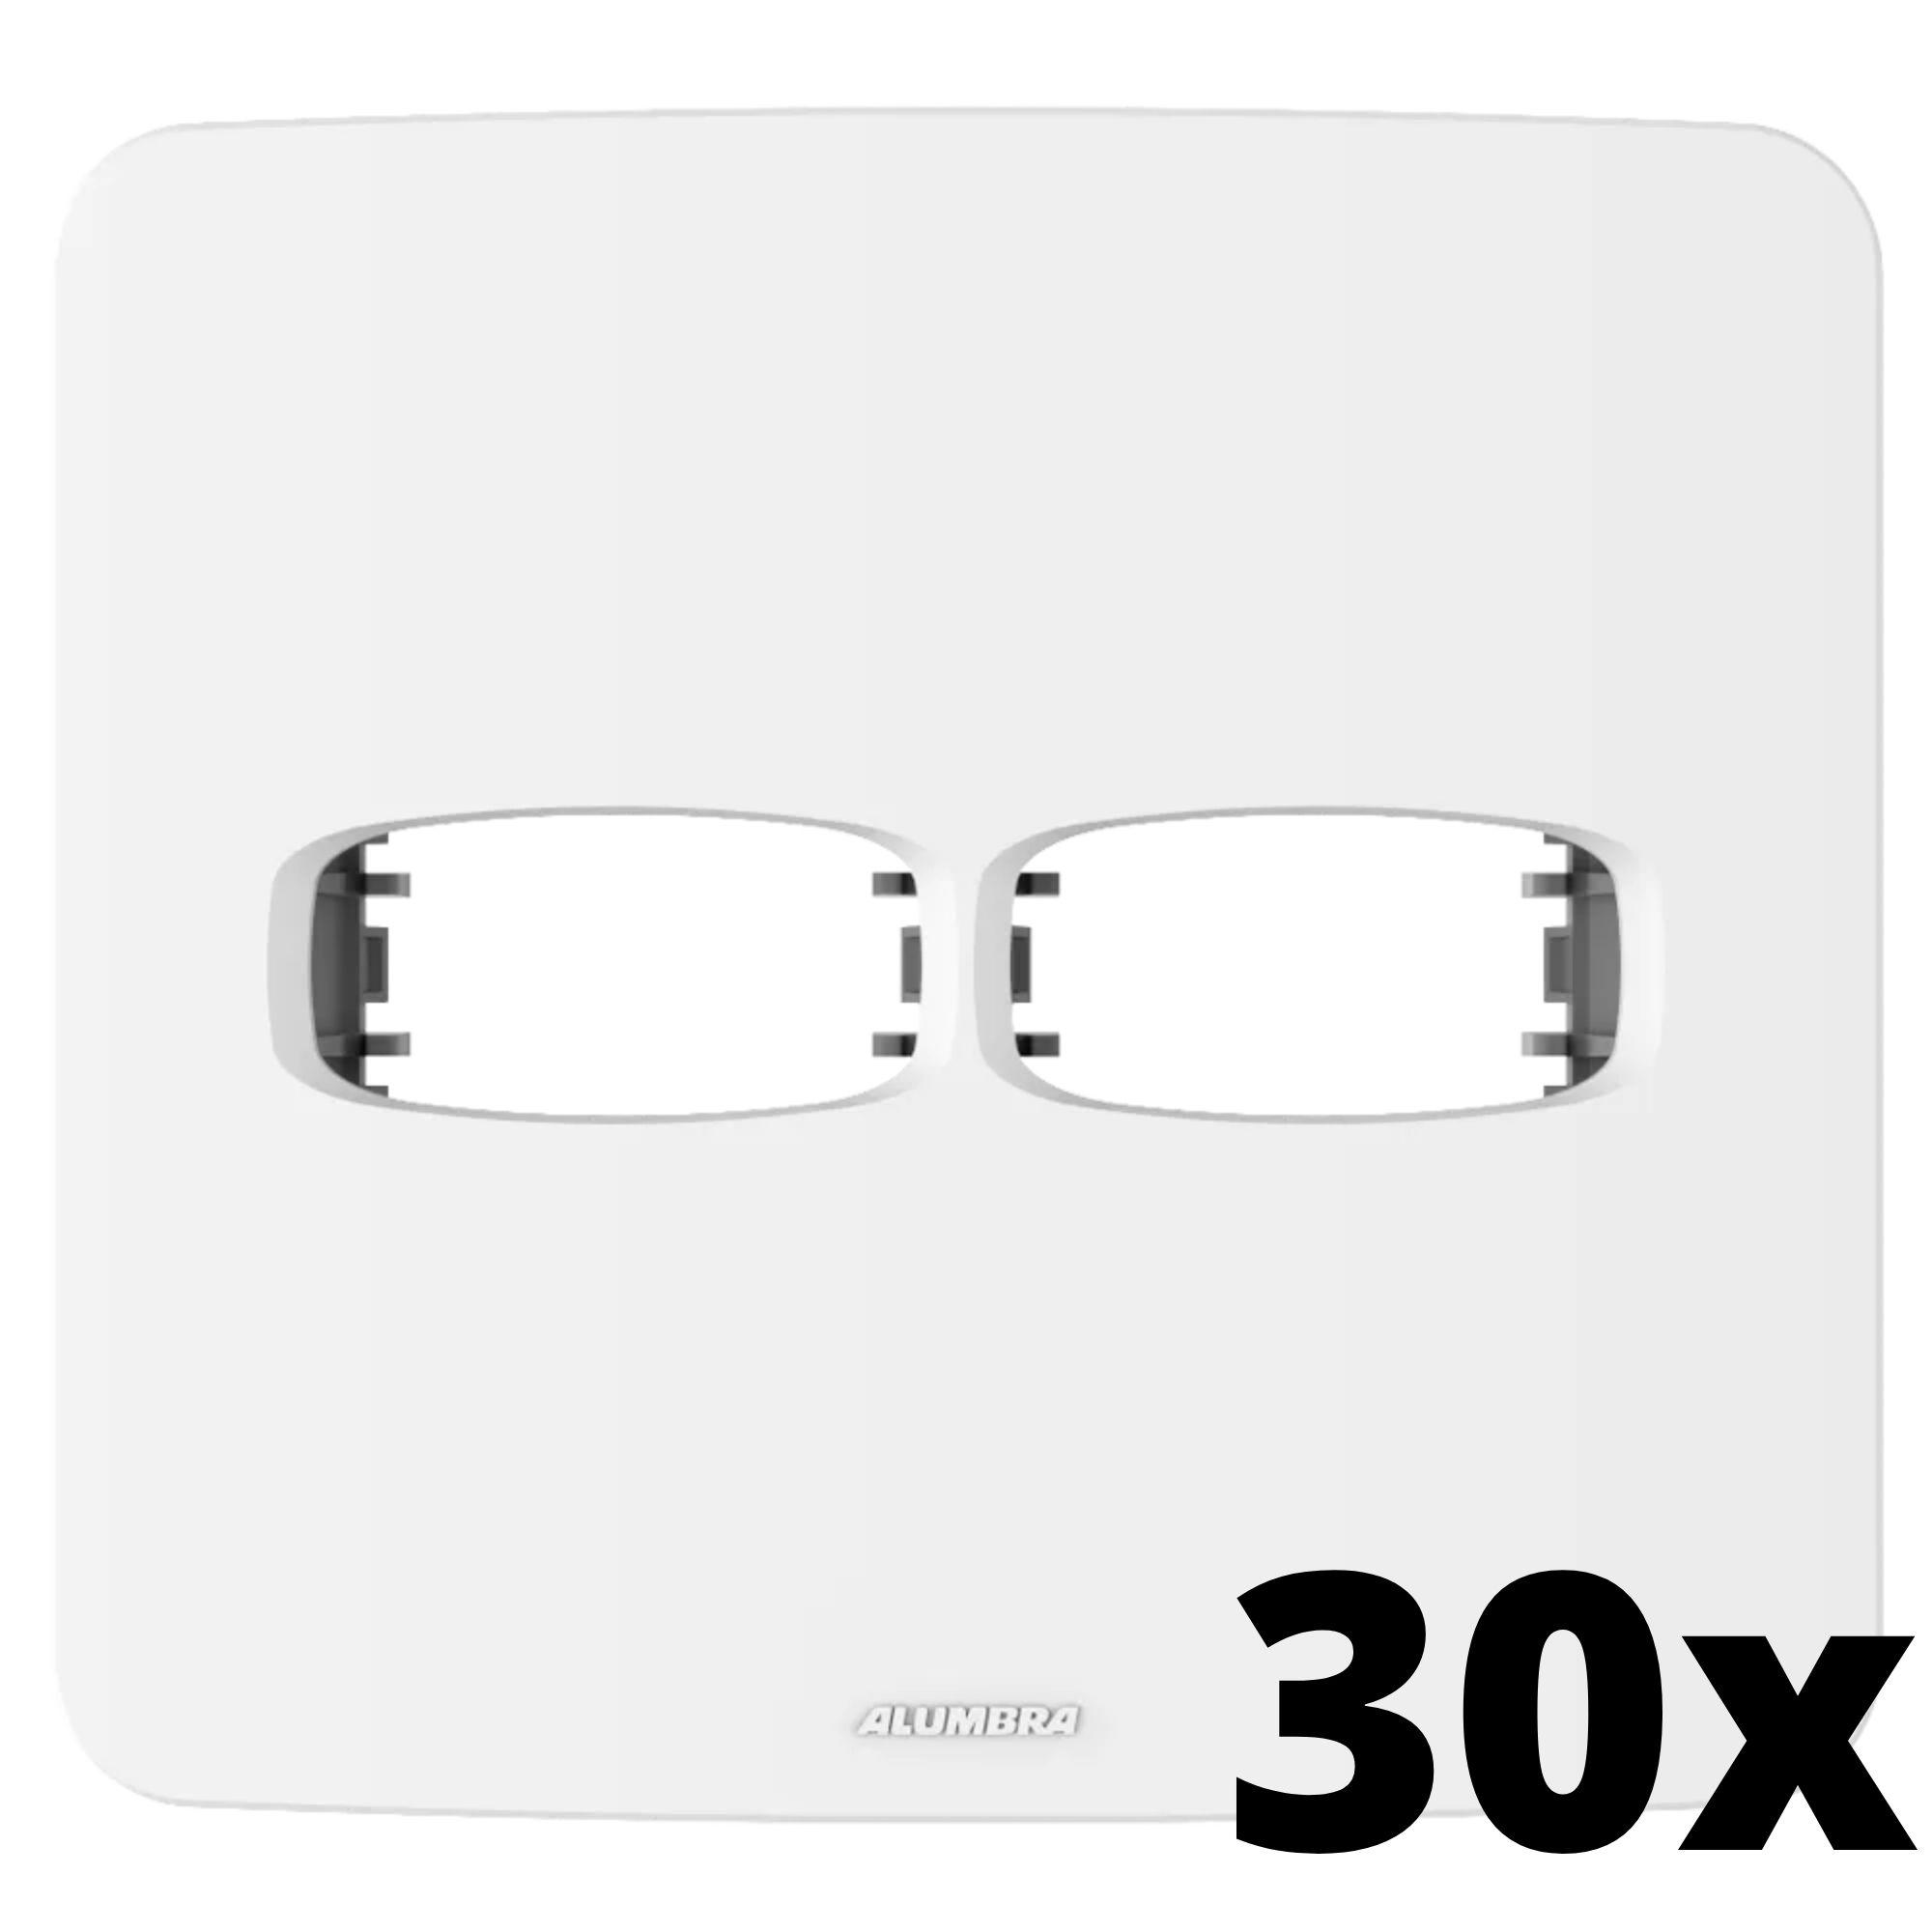 Kit 30 und Gracia Placa 4x4 1 Seção + 1 Seção